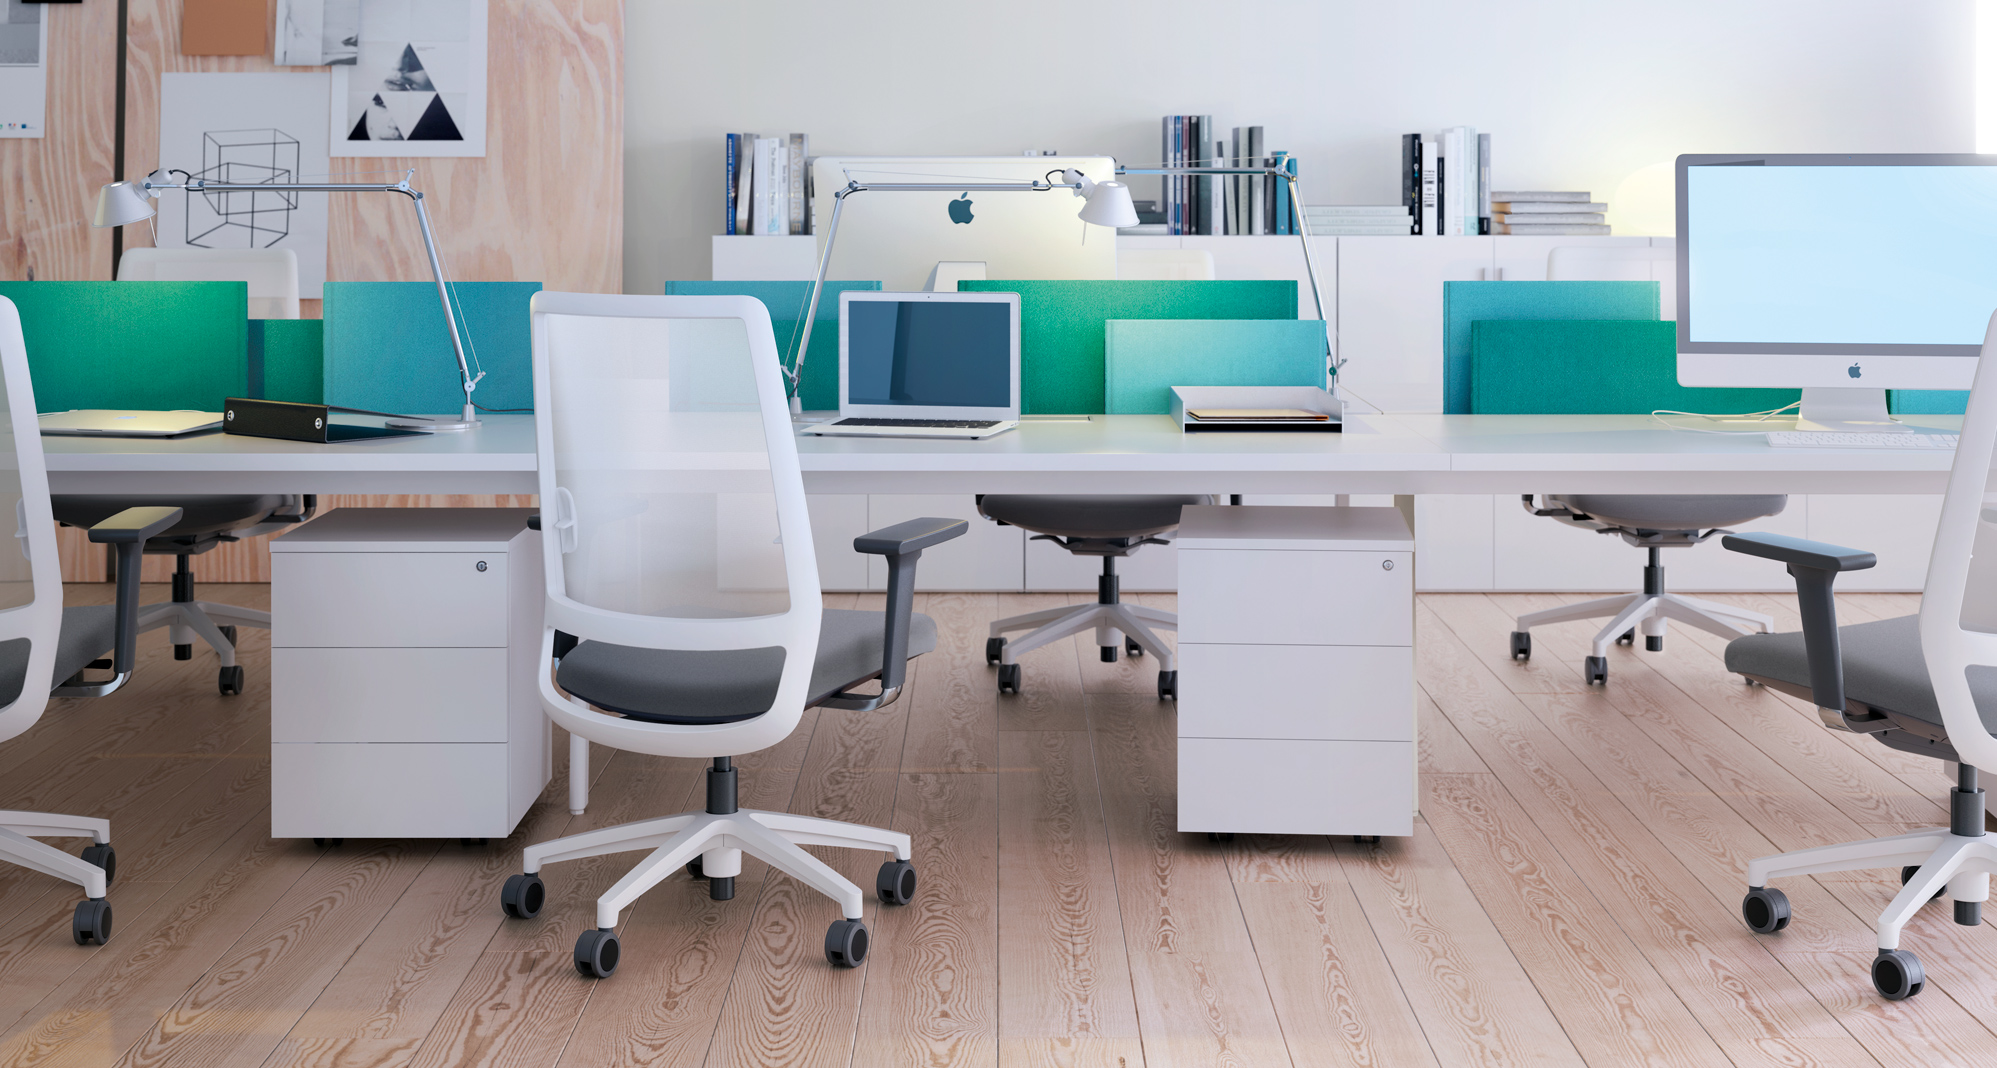 oficina-mobiliario-forma5-m10